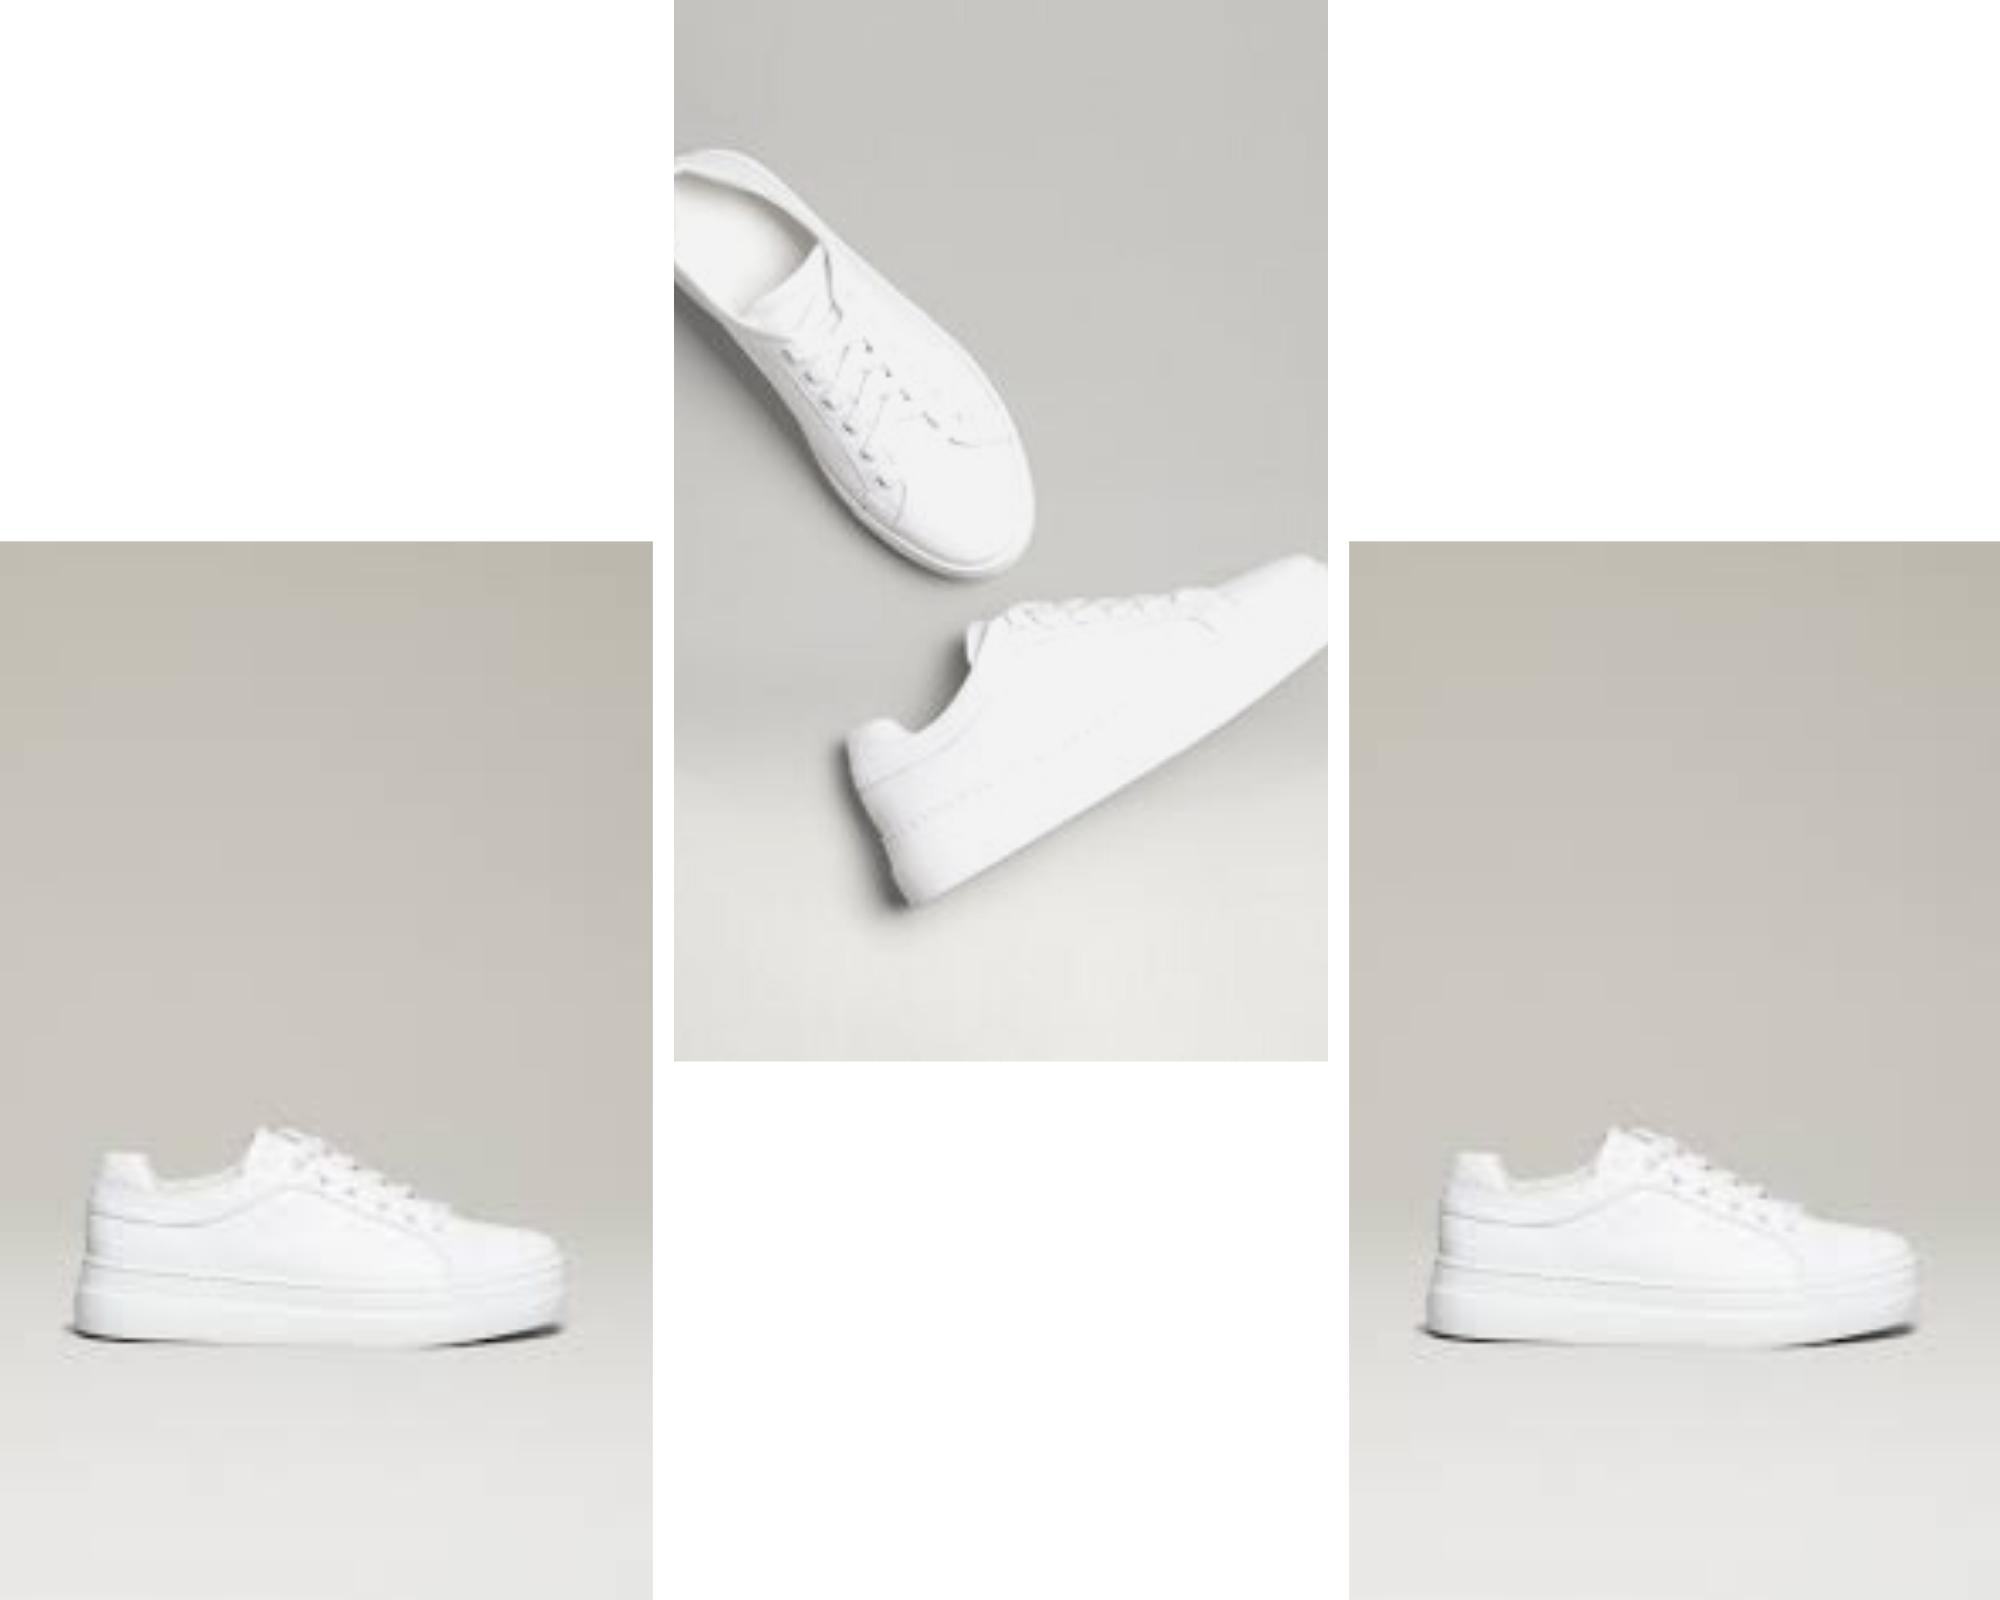 The Palestra Alta Platform. M Gemi Sneakers, Italian Sneakers, Gen Z Sneakers, White Leather Sneakers